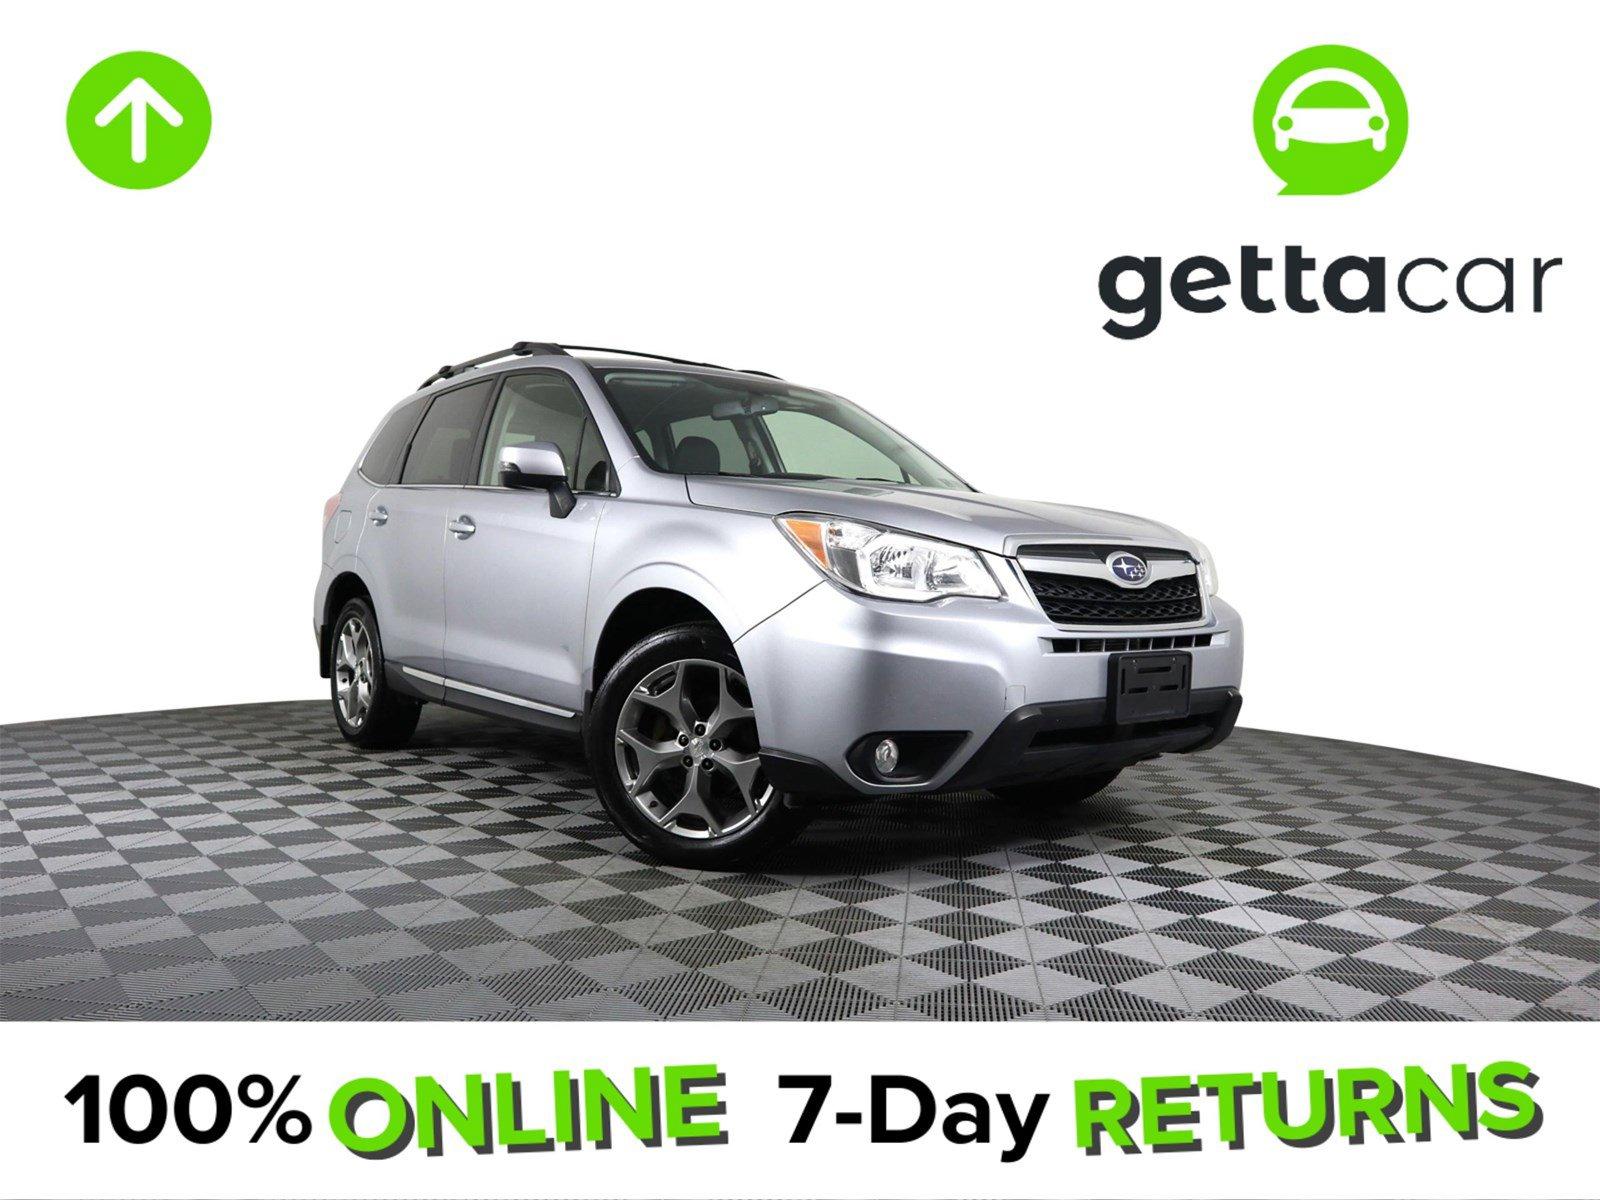 2016 Subaru Forester 2.5i Touring image